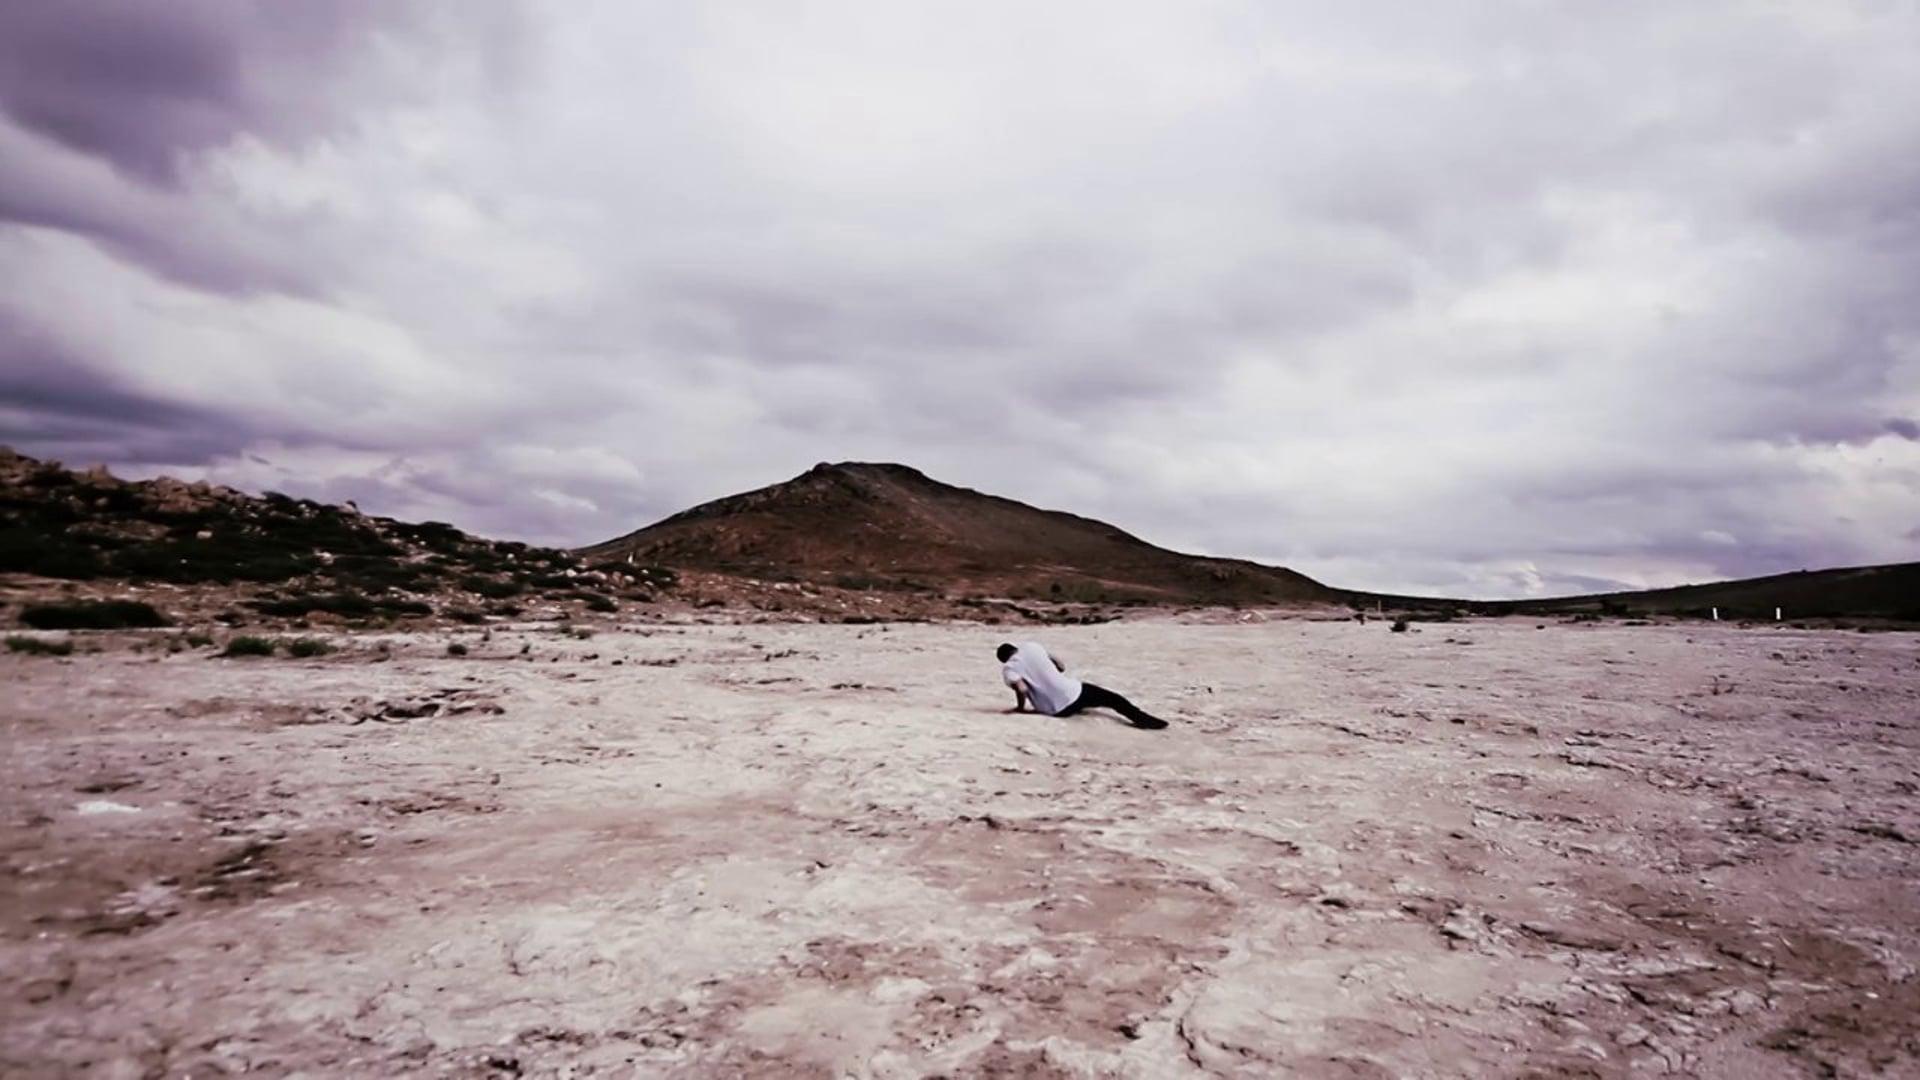 MEXICAN CORNER